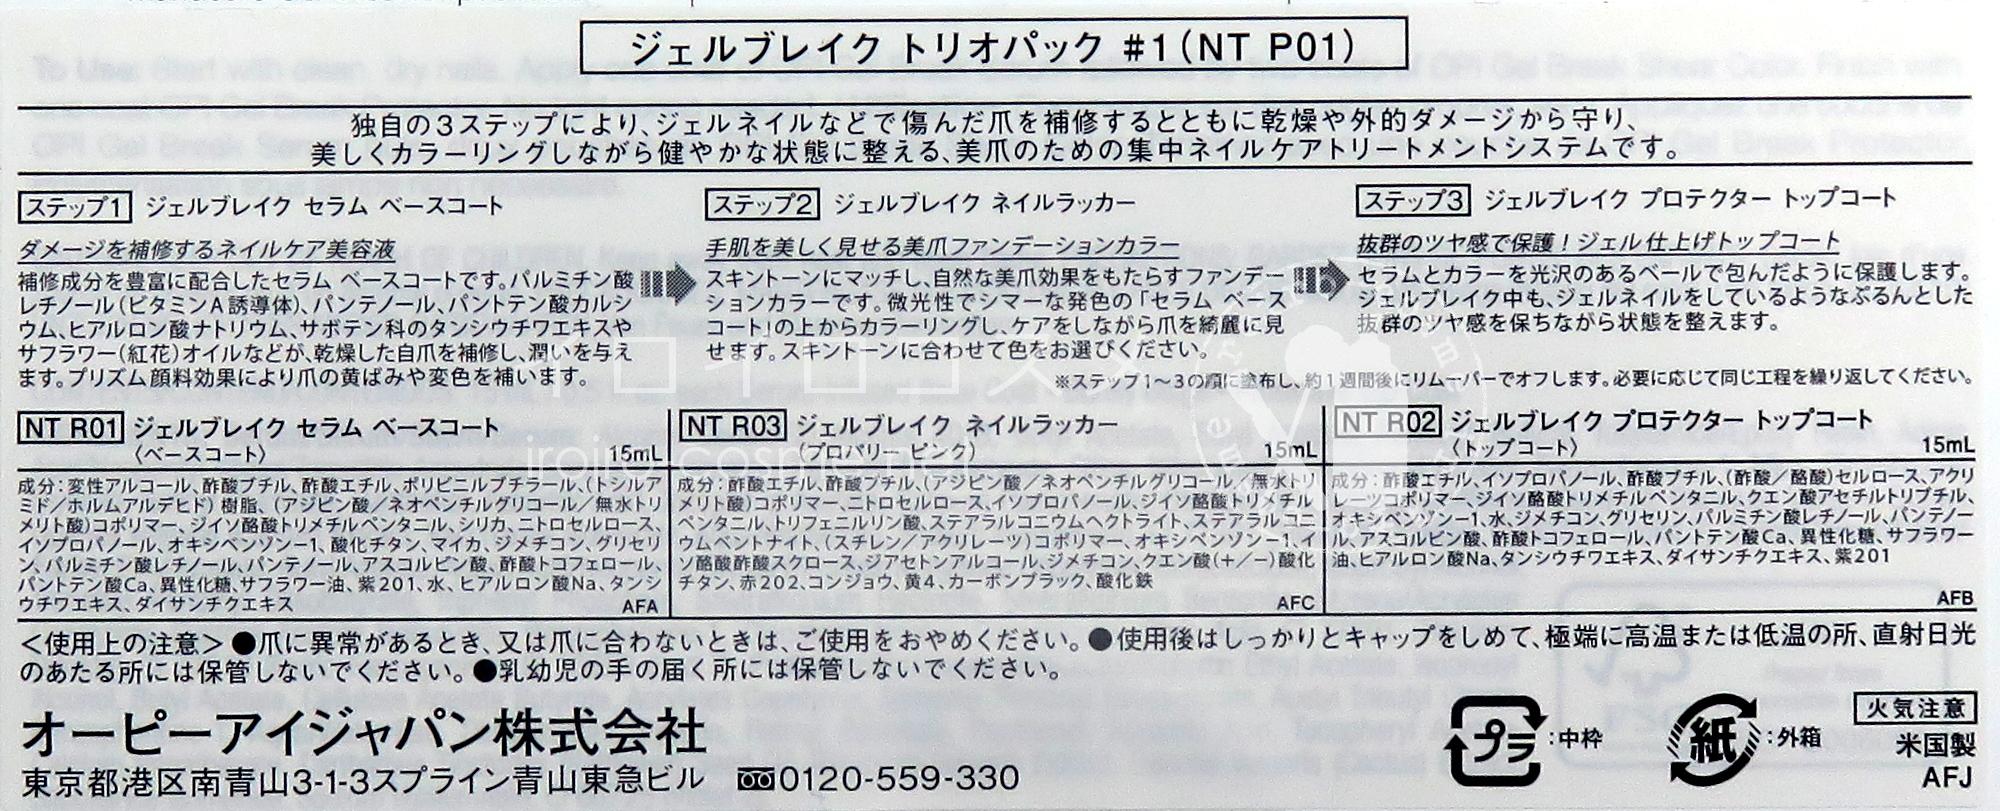 OPI オーピーアイ ジェルブレイク トリオパック #1 NTP01 (NT R03 プロパリーピンクセット) マニキュア 説明書き 全成分